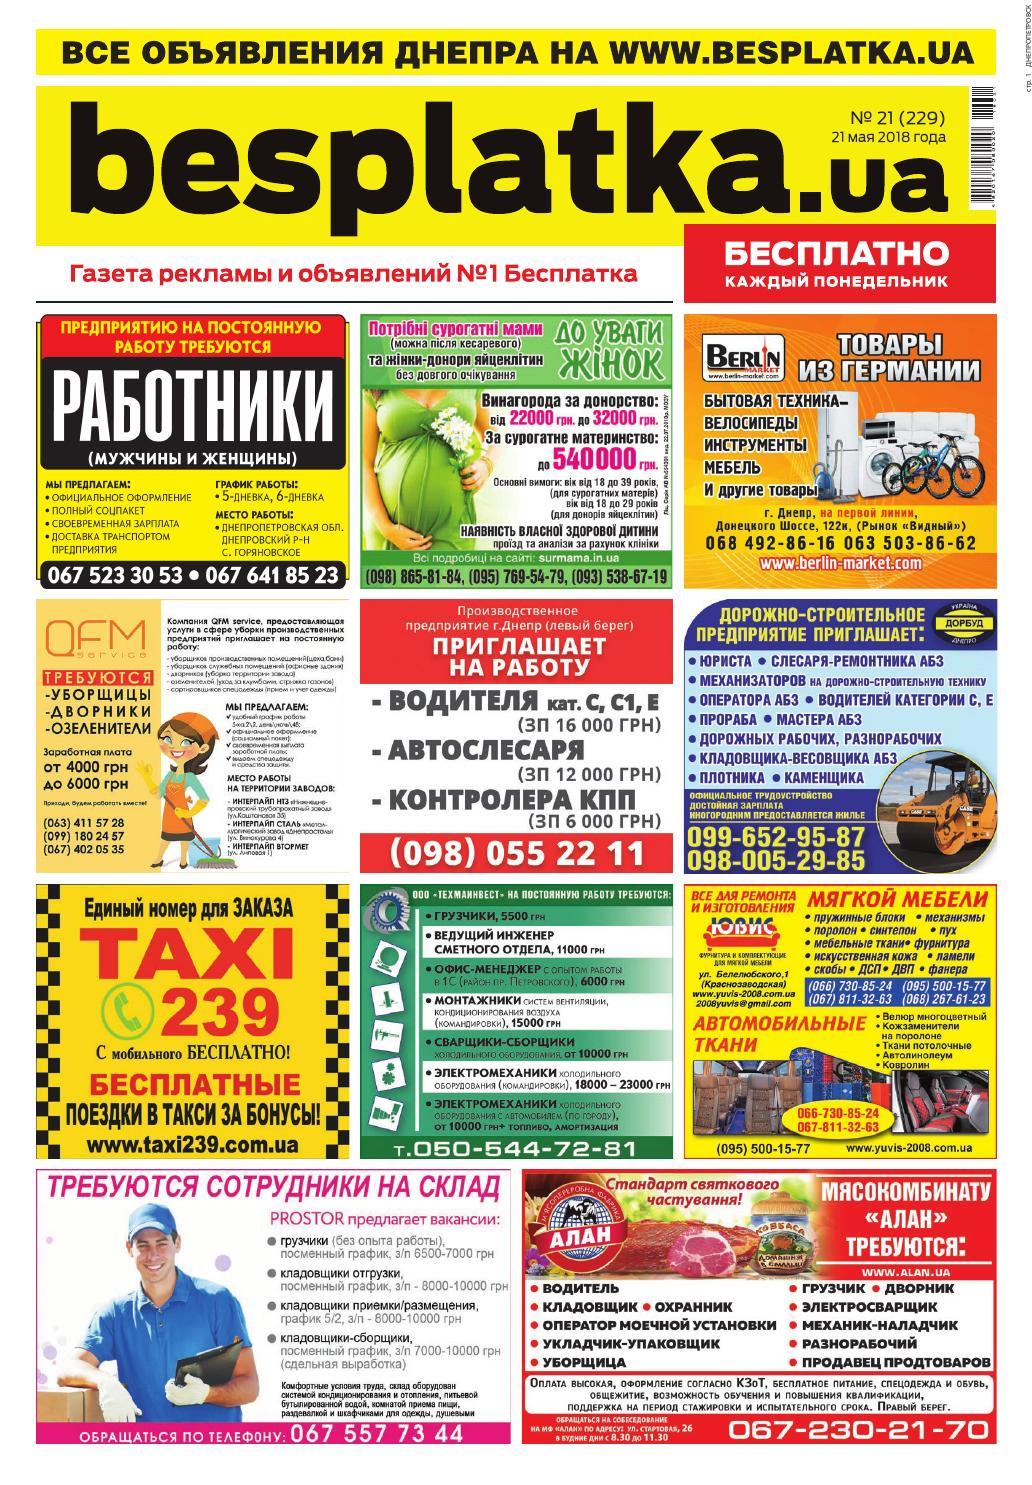 ea069b7c50b2 Besplatka  21 Днепр by besplatka ukraine - issuu